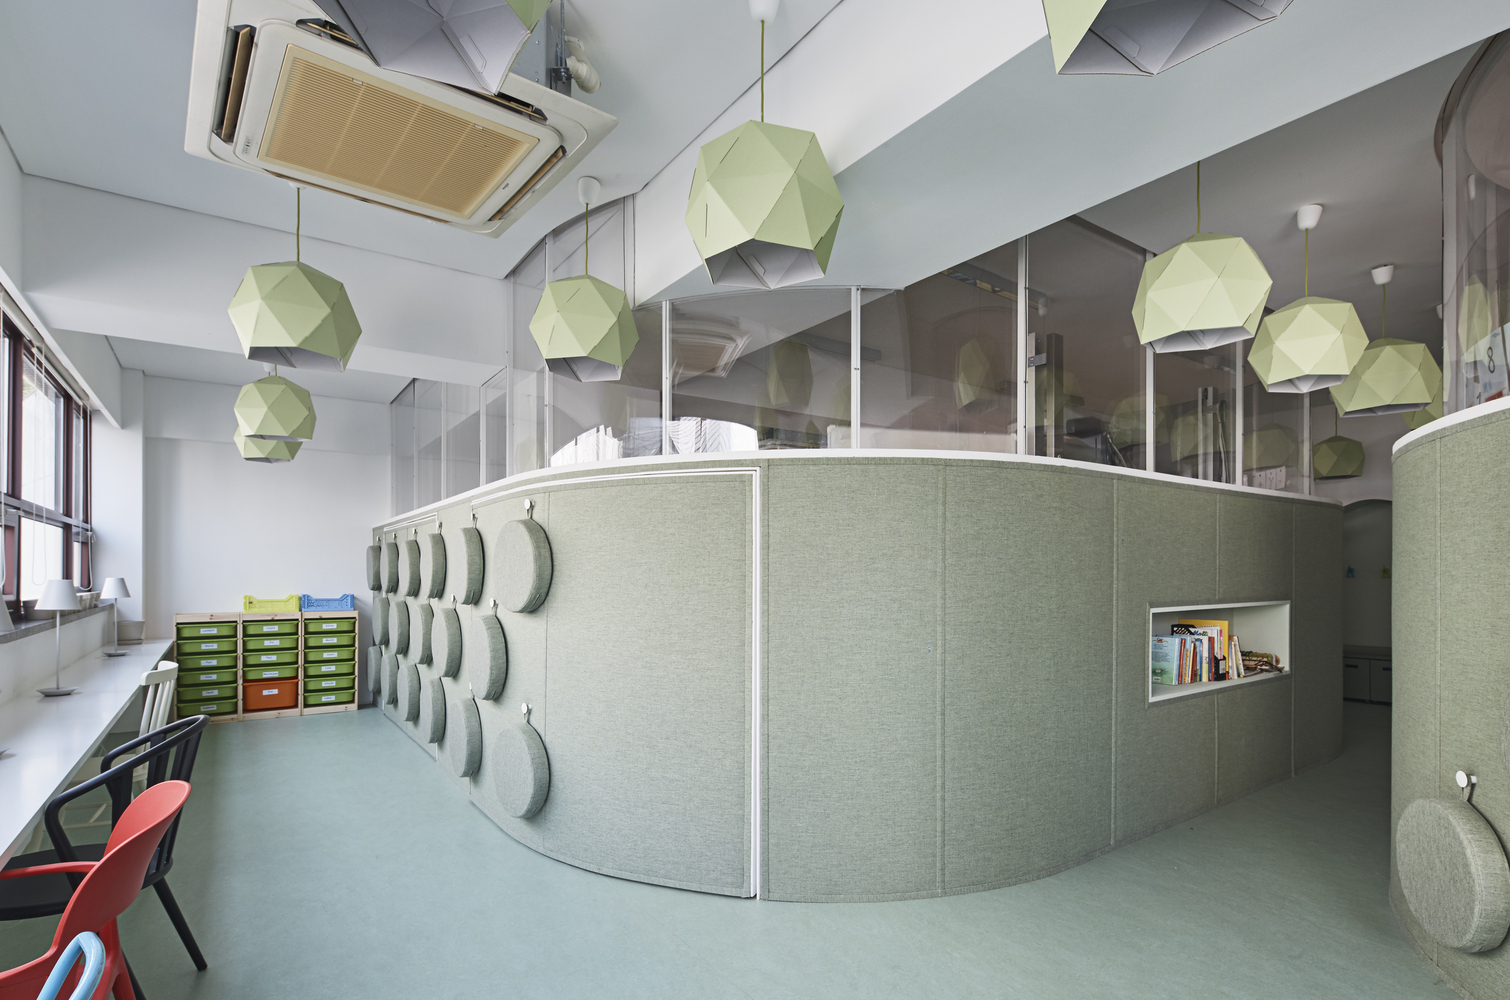 DSSI-Elementary-School-Seoul-Image-8.jpg